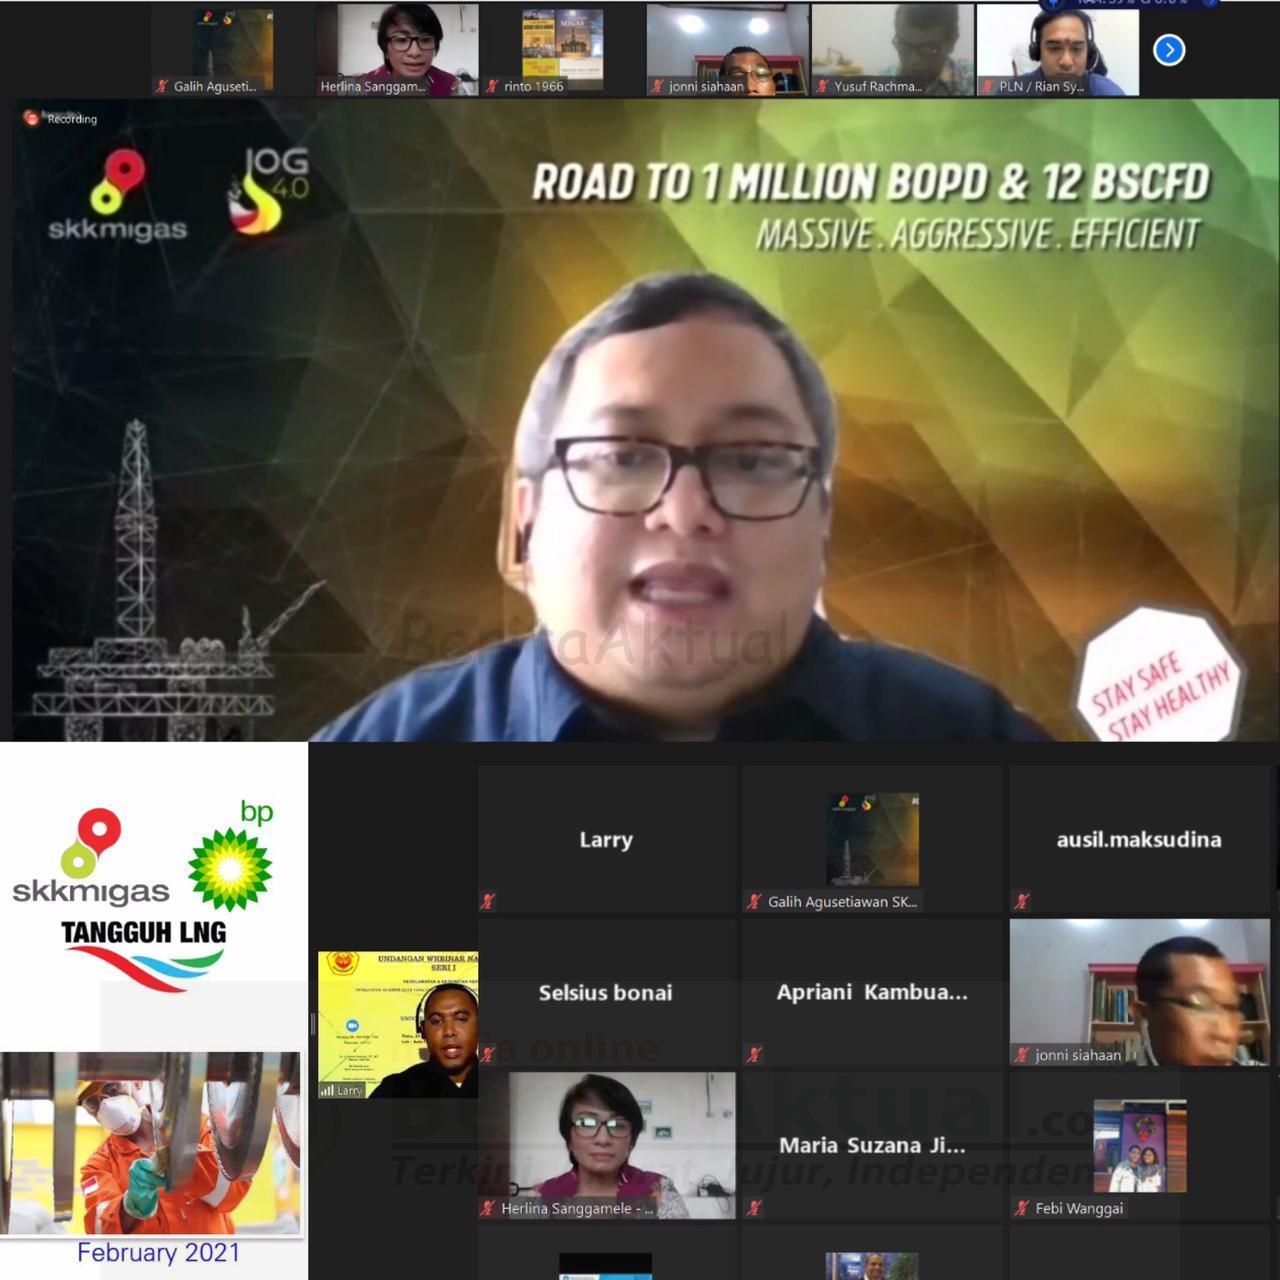 Industri Hulu Migas Wil Papua Maluku Dukung Pencanangan Bulan K3 Bersama Civitas Akademika Uncen 3 IMG 20210225 WA0001